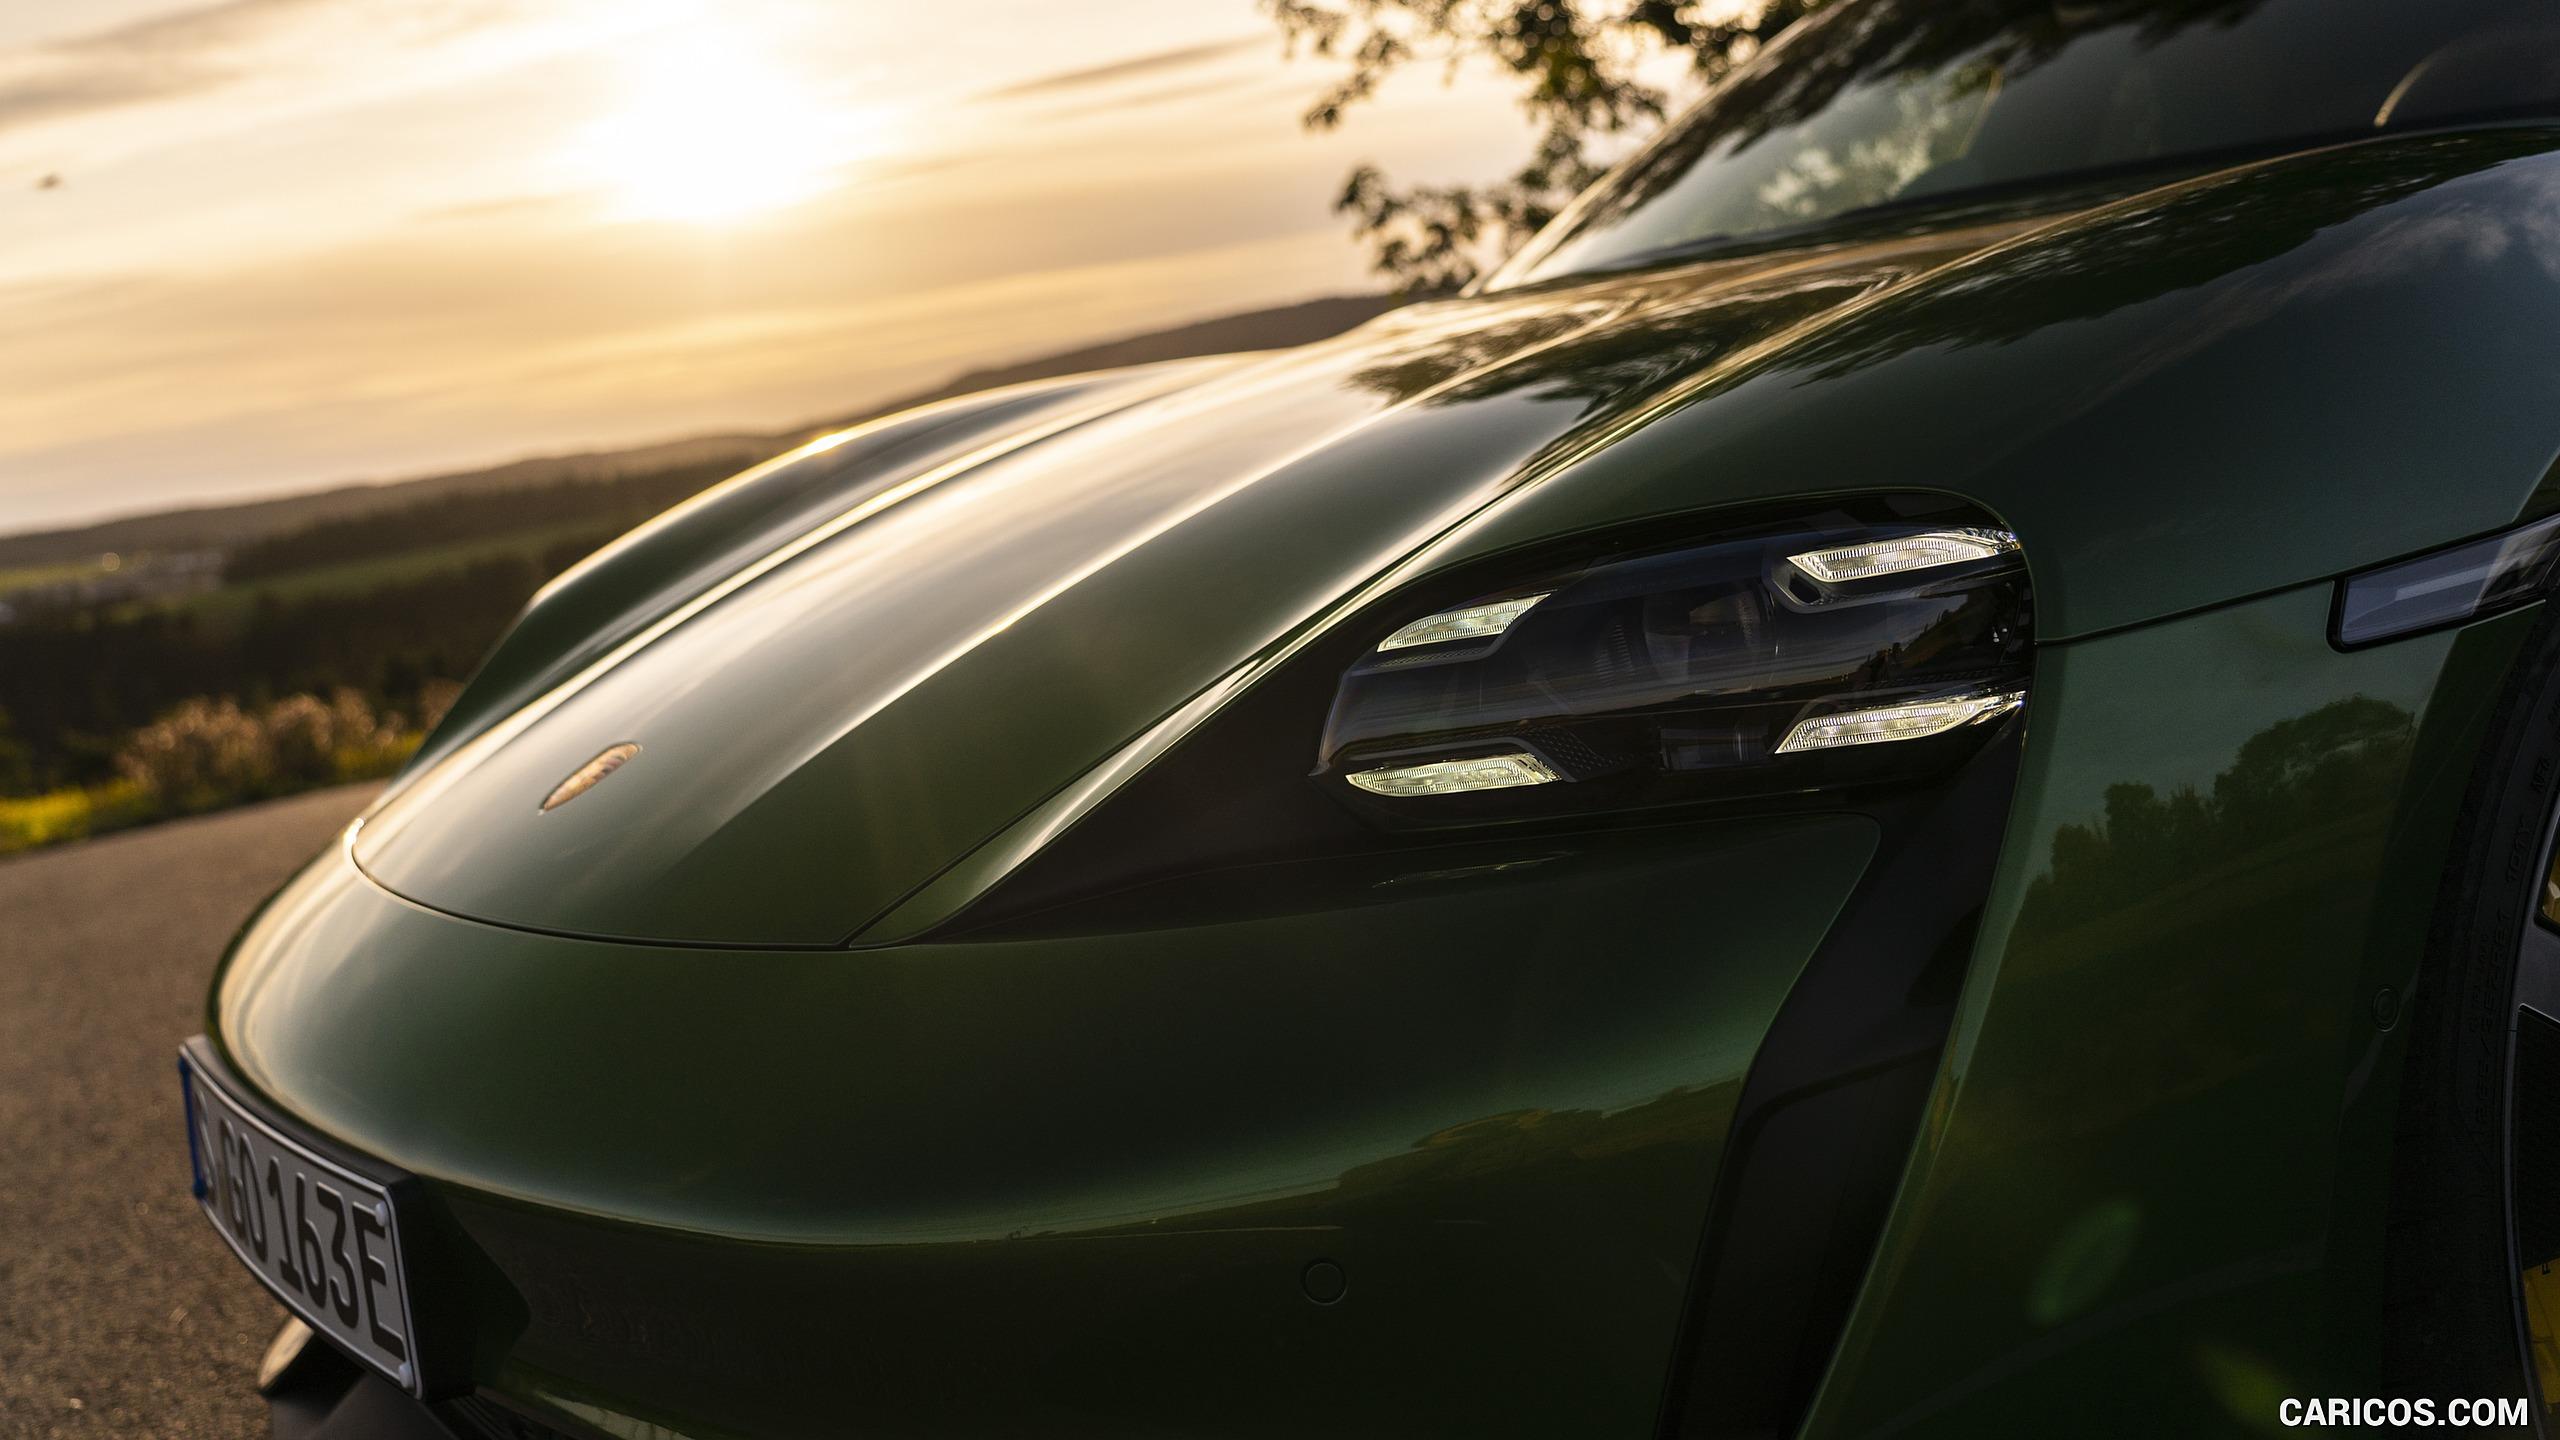 2020 Porsche Taycan Turbo S Color Mamba Green Metallic 2560x1440